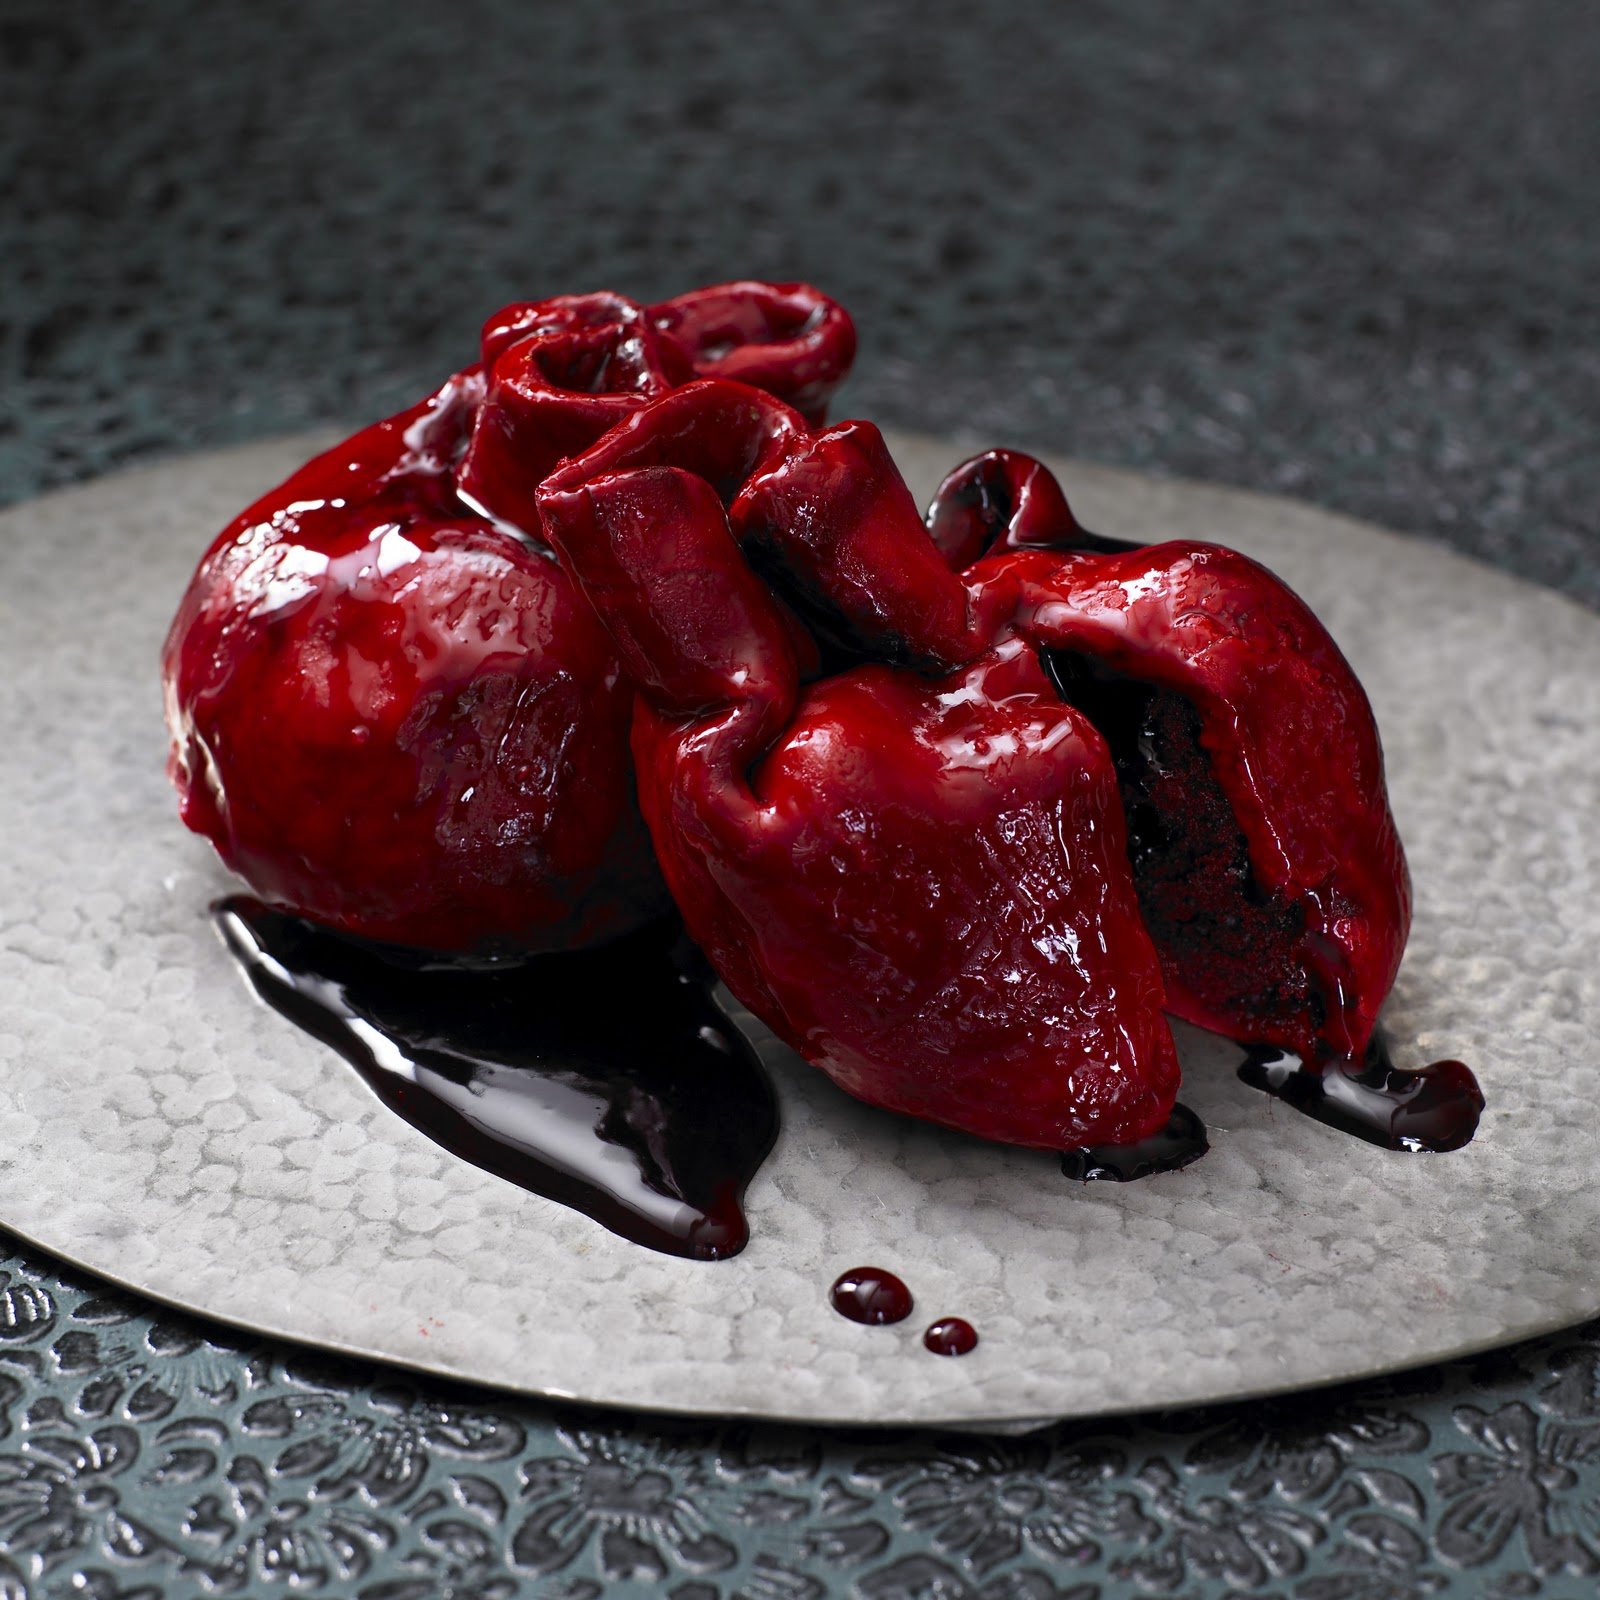 Not So Humble Pie: True Love: A Human Heart Cupcake